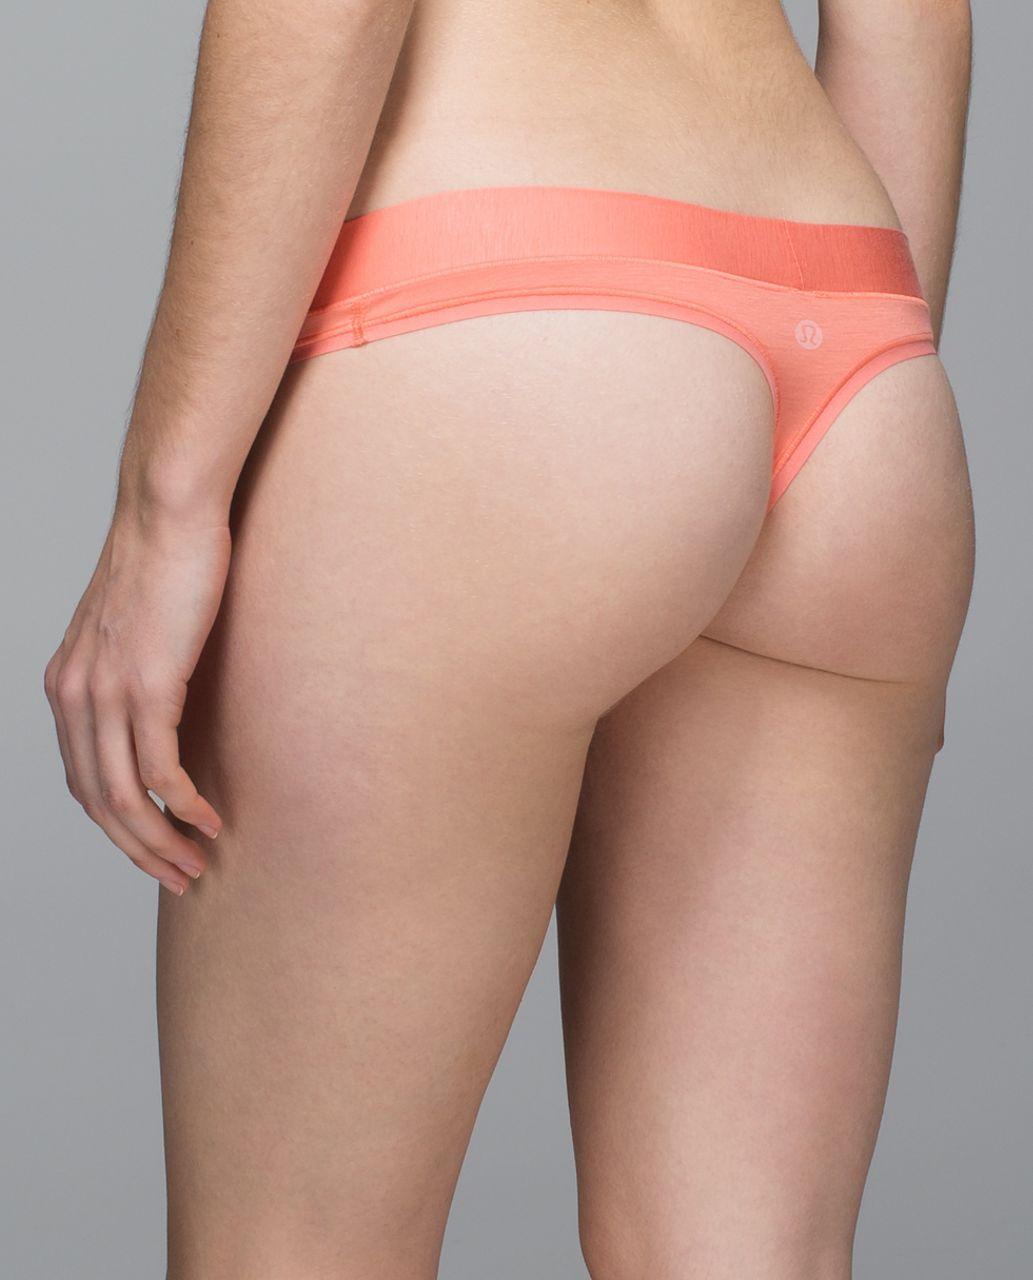 Lululemon Mula Bandhawear Thong - Plum Peach